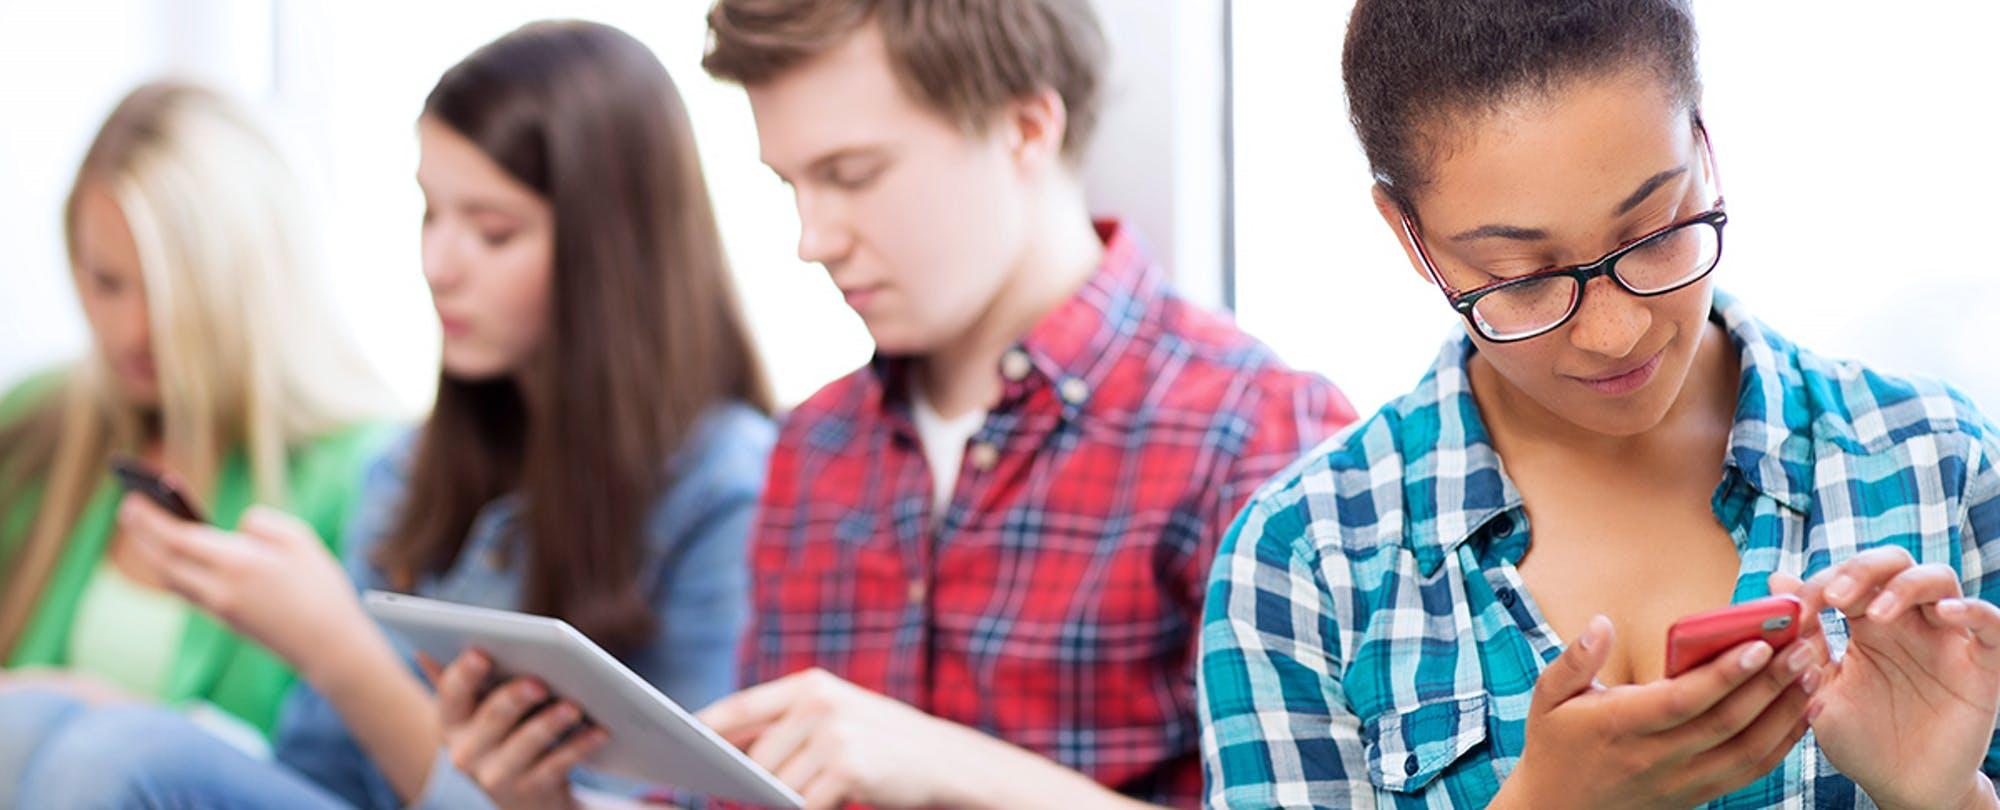 Student Engagement Platform ClearScholar Raises $1.25M in Seed Round